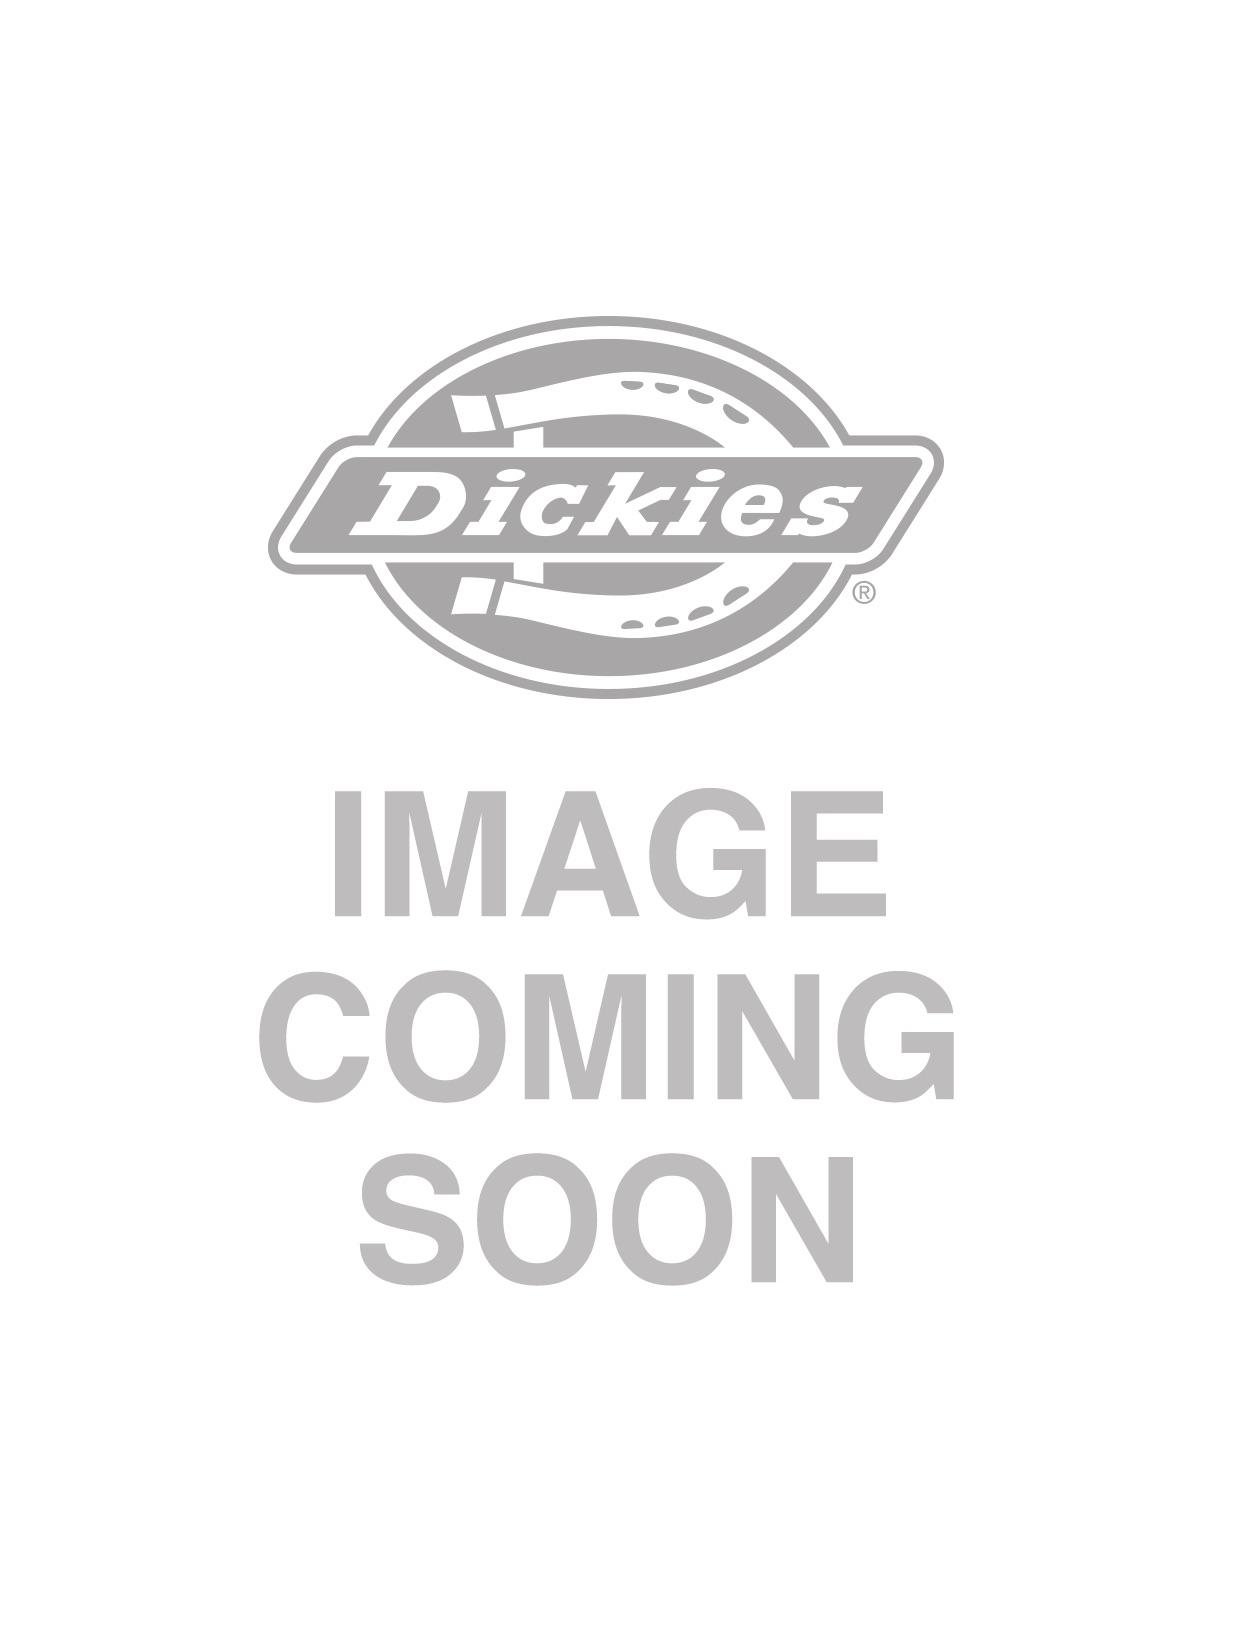 Dickies Jordanville Trouser